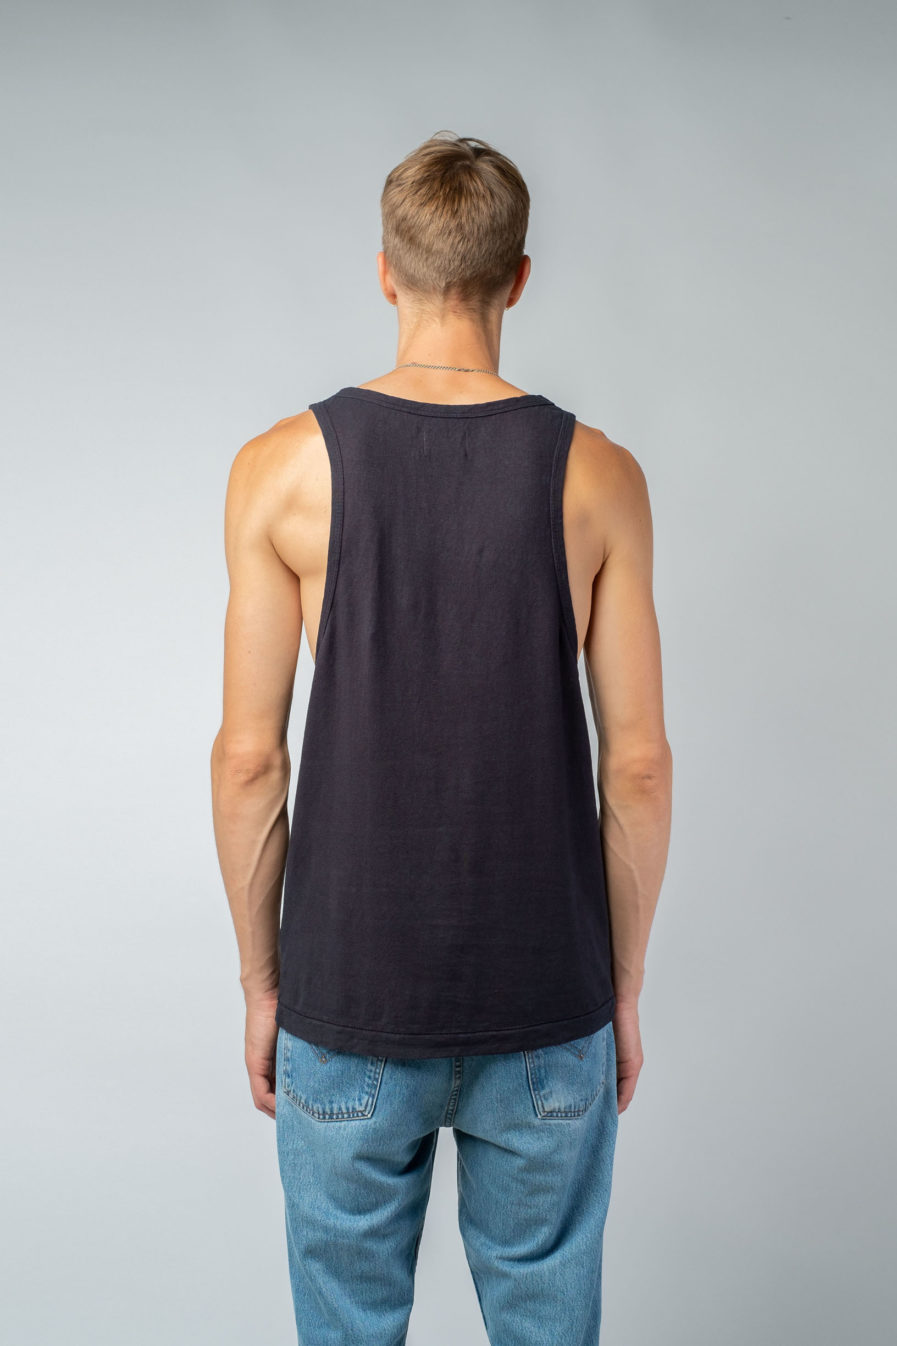 MAN unisex singlet tanktop hemp organic cotton LAU Carbon black back